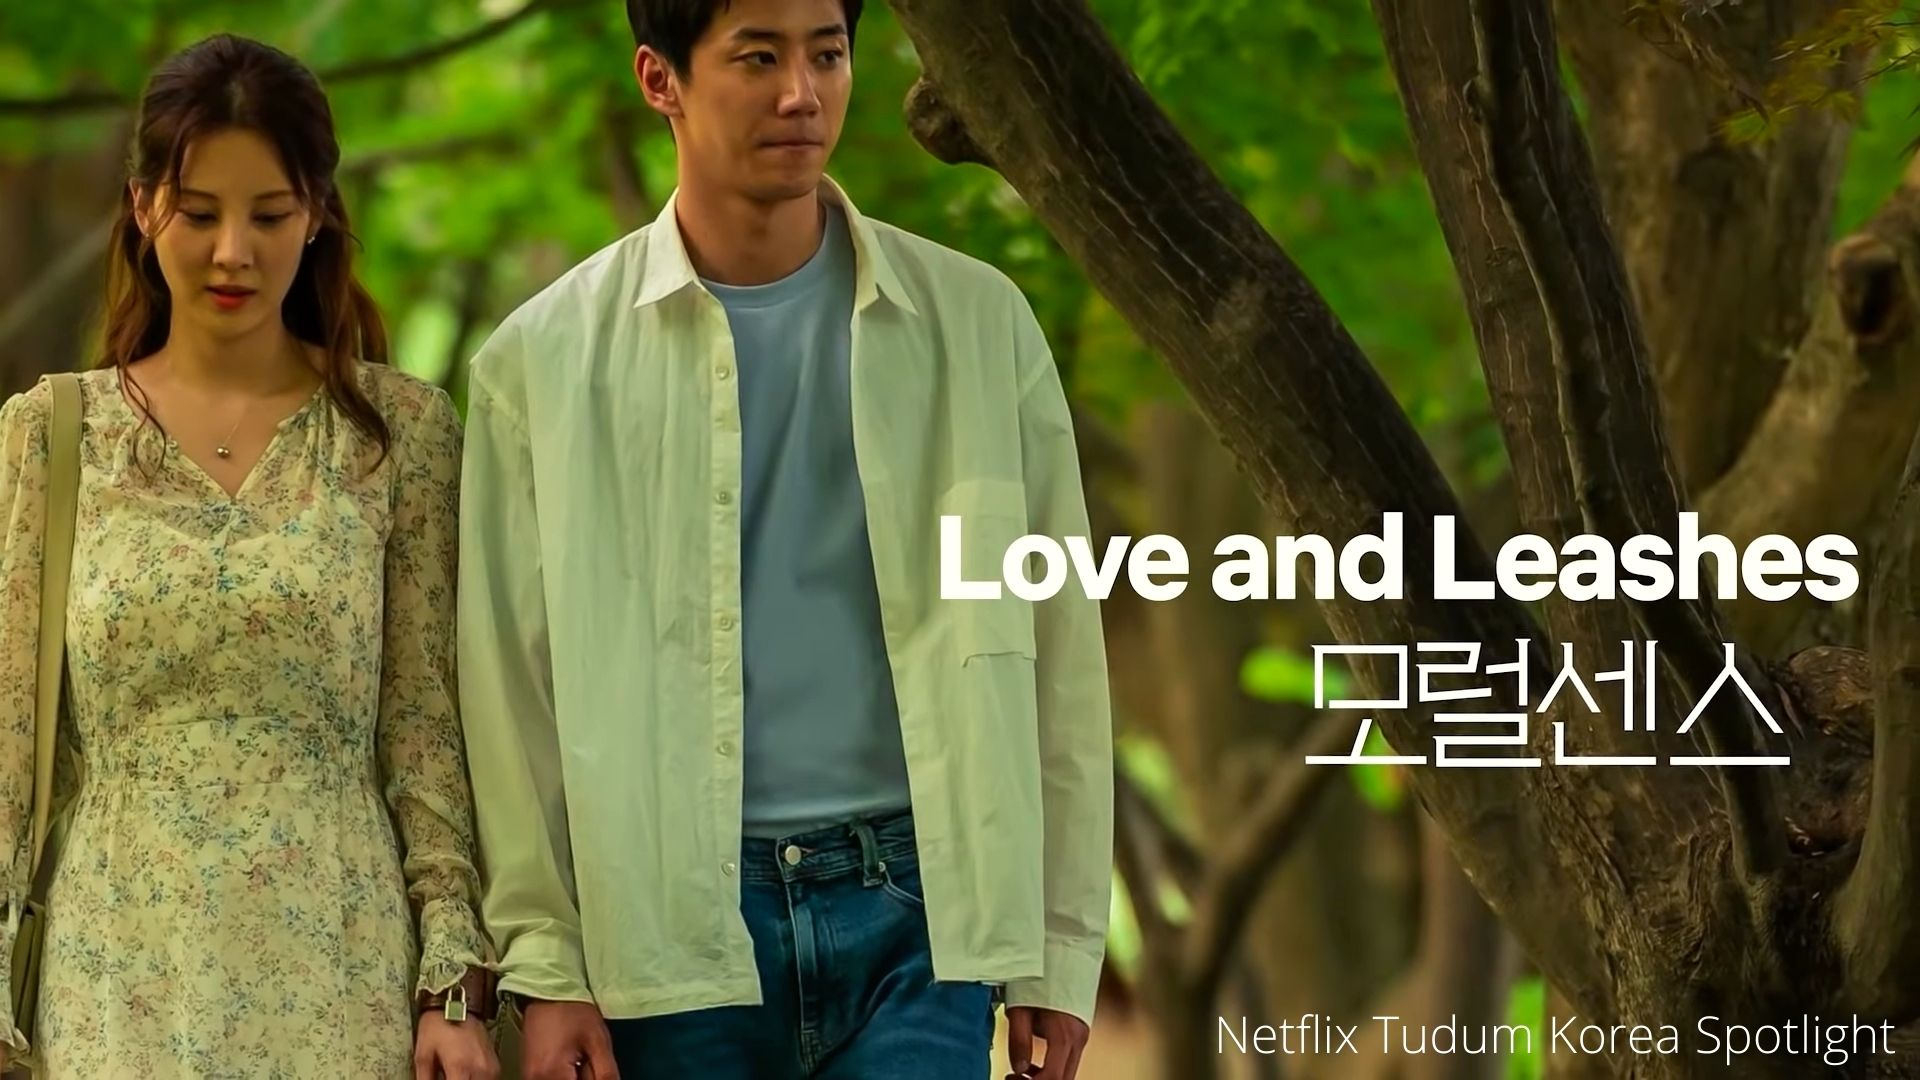 Netflix TUDUM Korea Spotlight